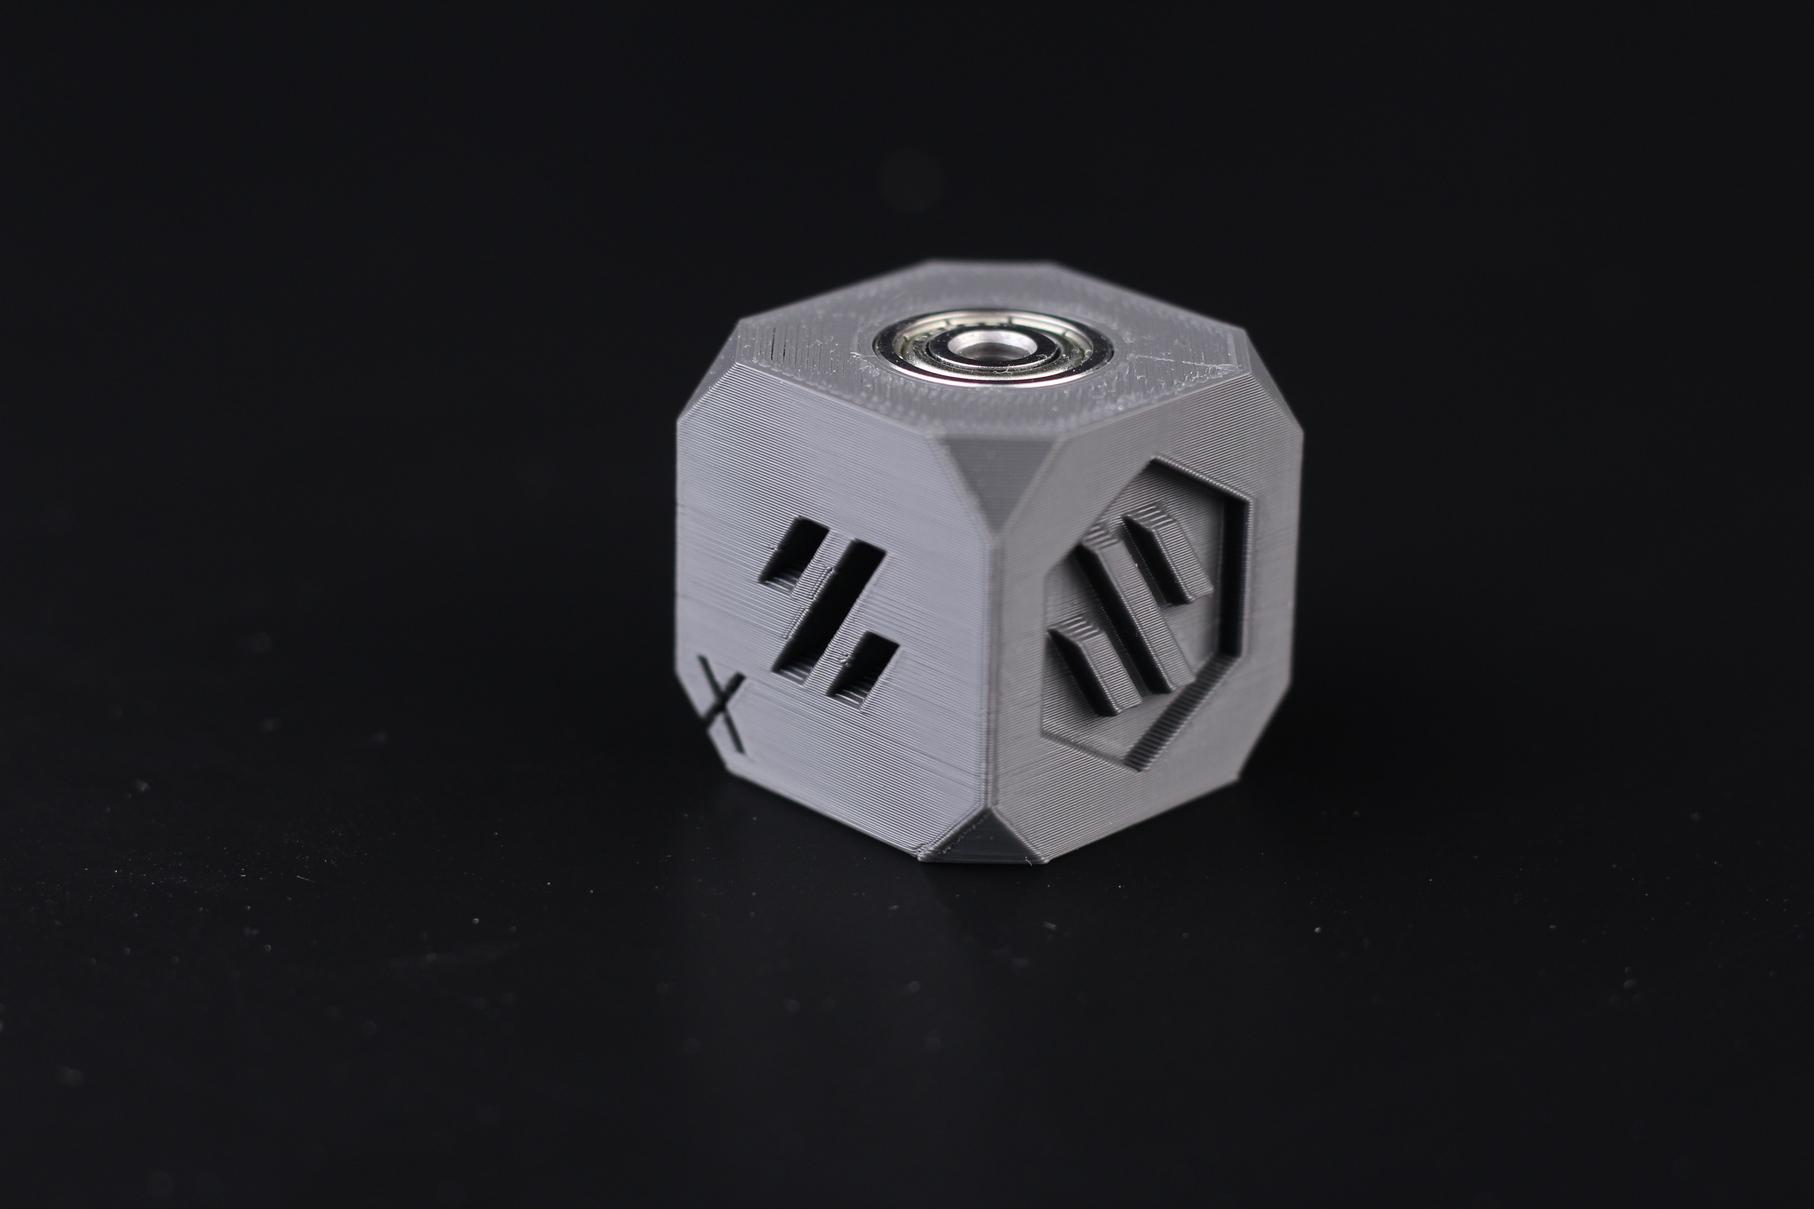 Voron-Cube-printed-on-Ender-3-Max-5